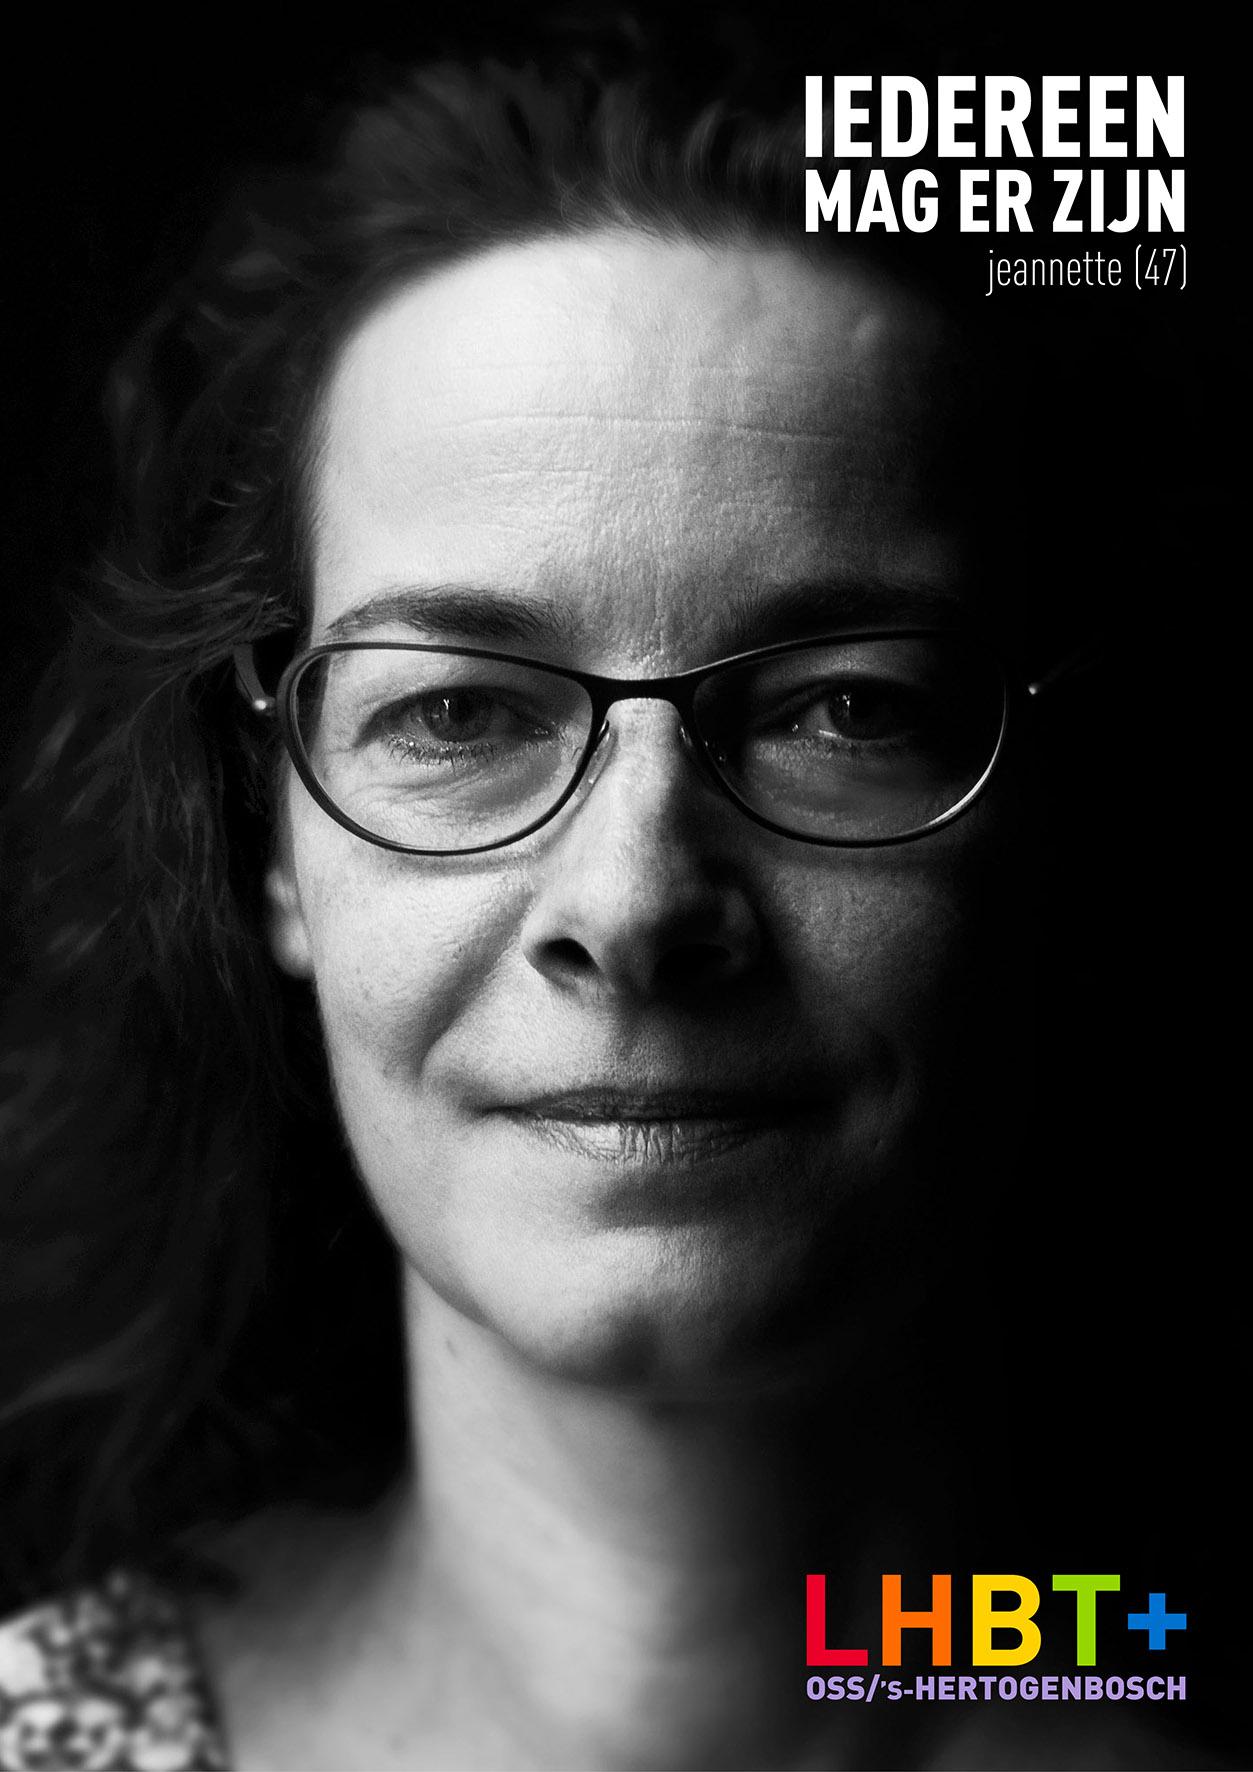 Jeannette van der Sanden